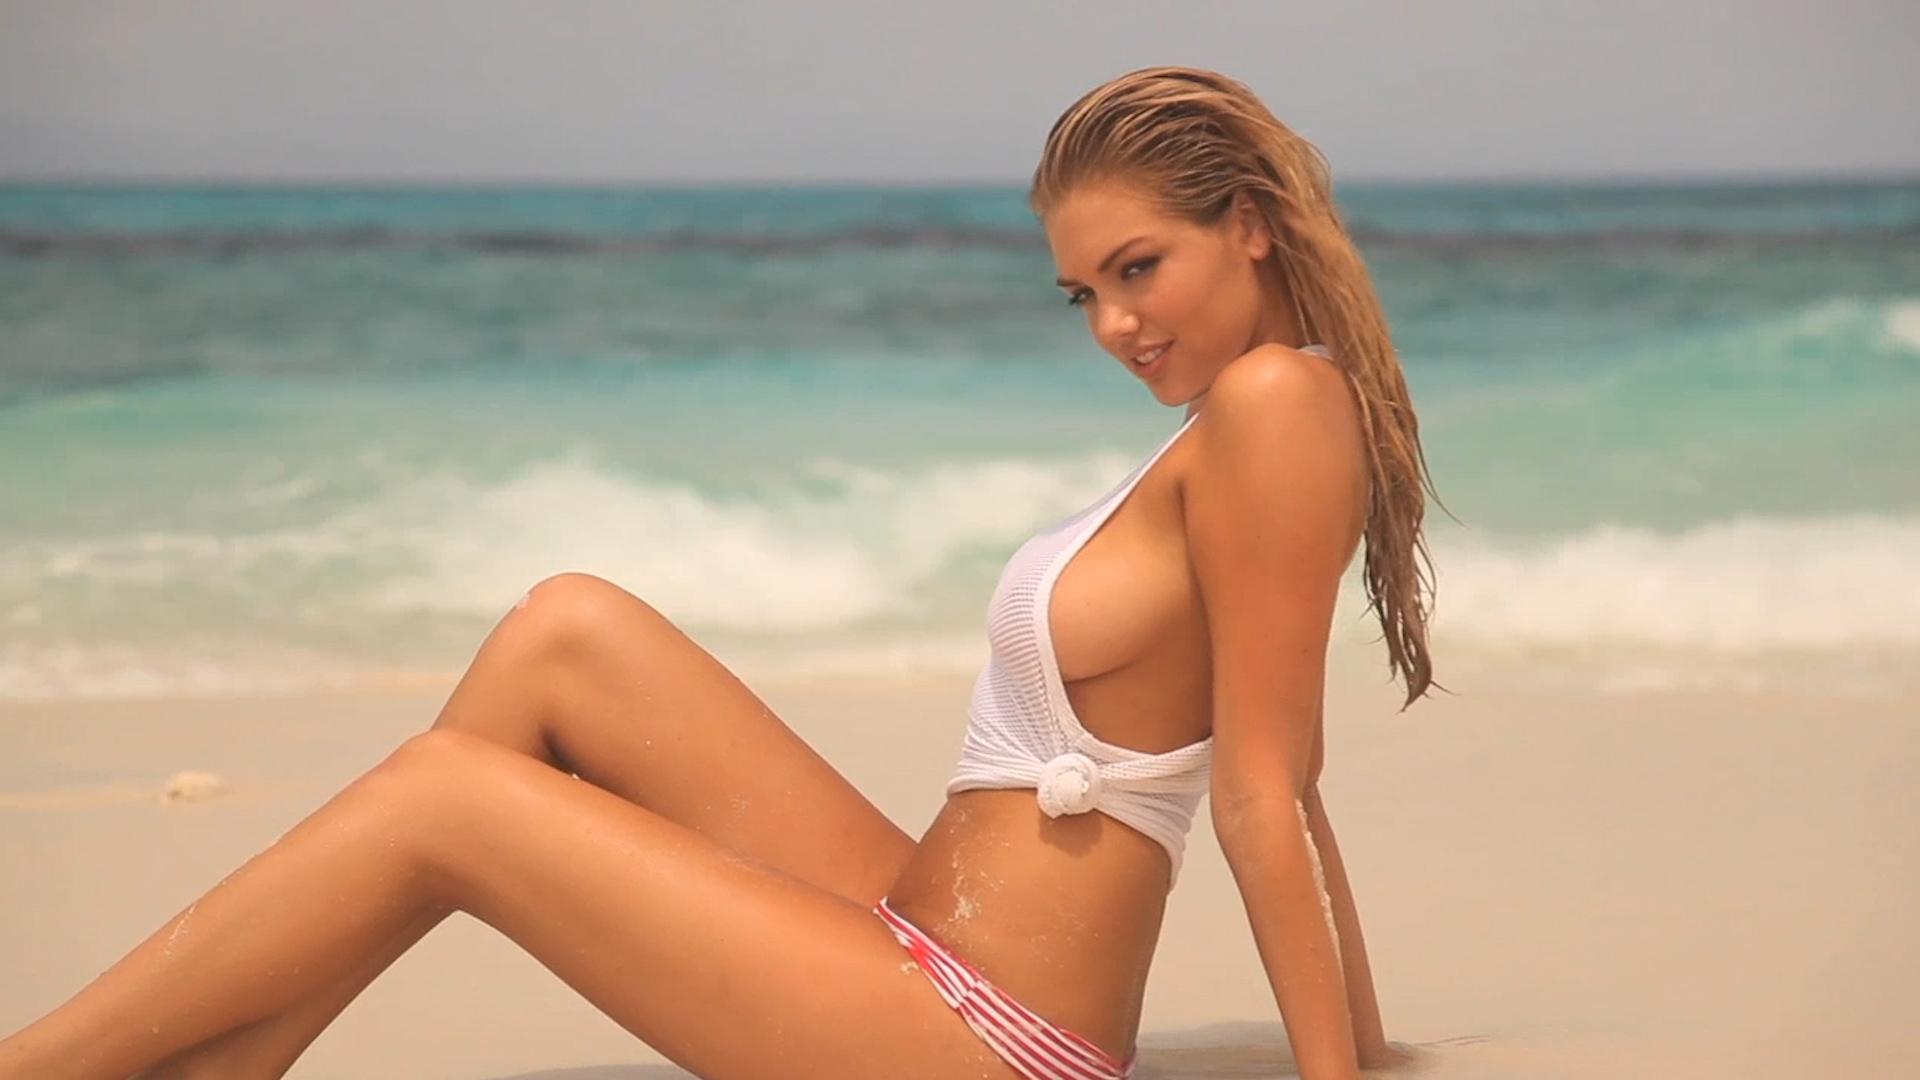 Kate Upton in Australia SI Swimsuit 2012 (image)